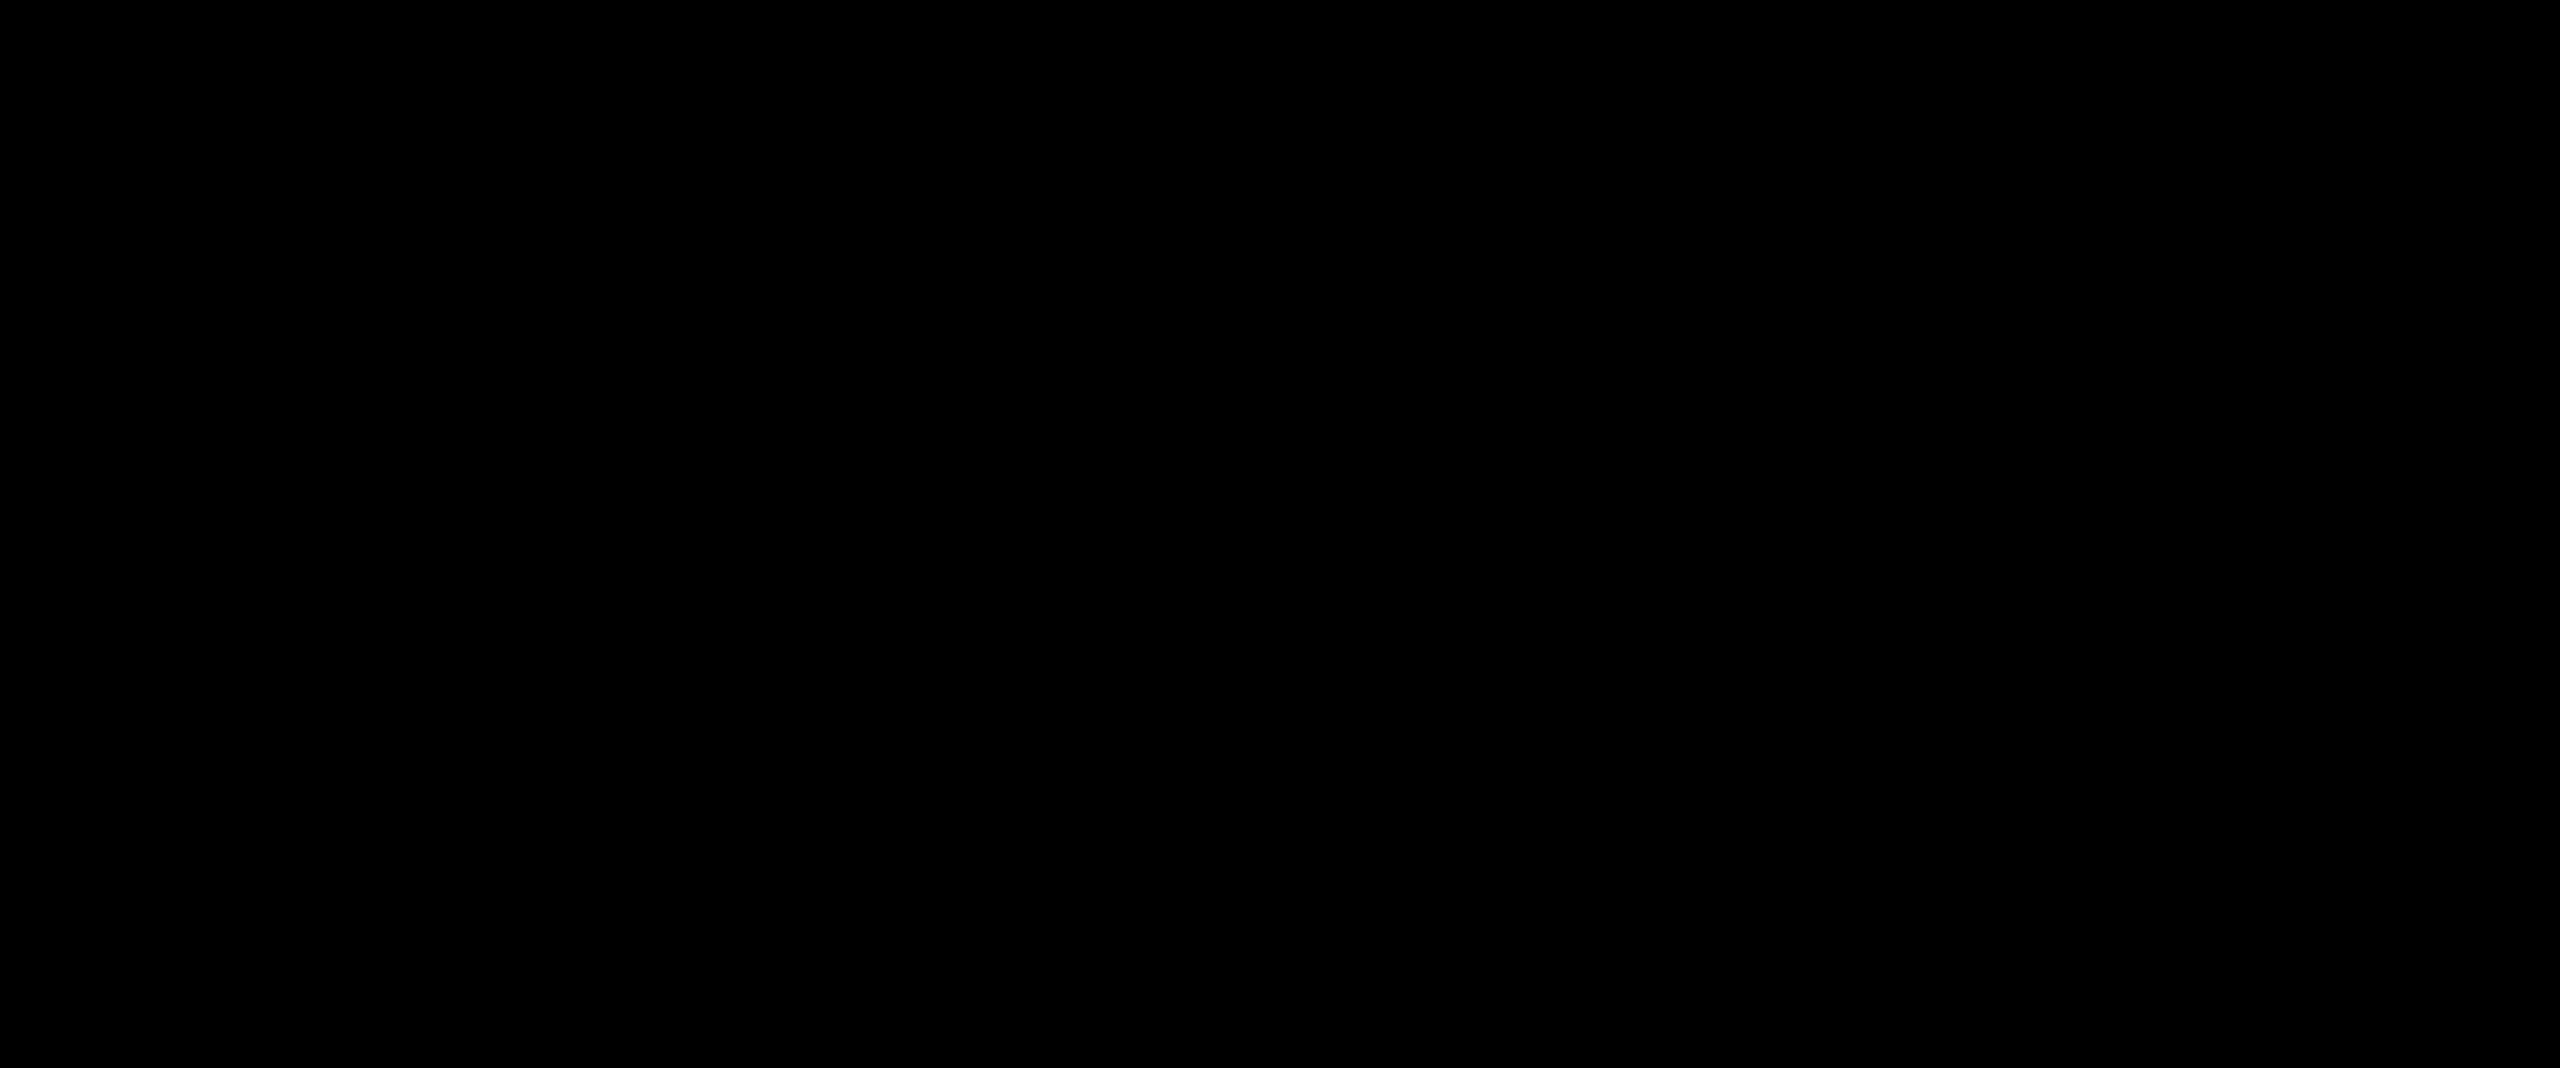 Intercontinental 5G Network Slice